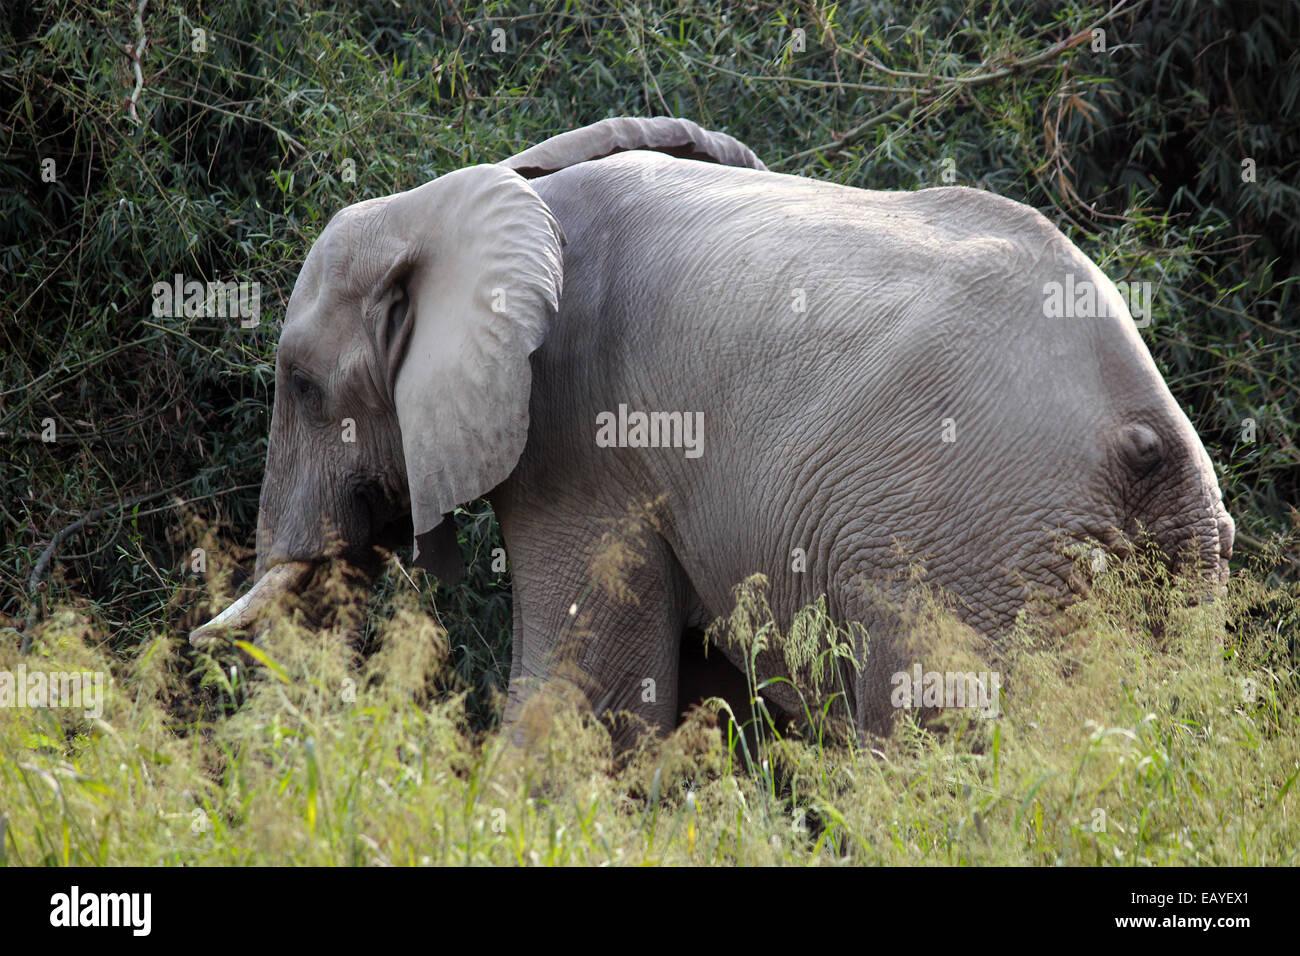 Elephant, Elephantine, Proboscidea, tusk, big ears, big body in New Delhi, India, - Stock Image